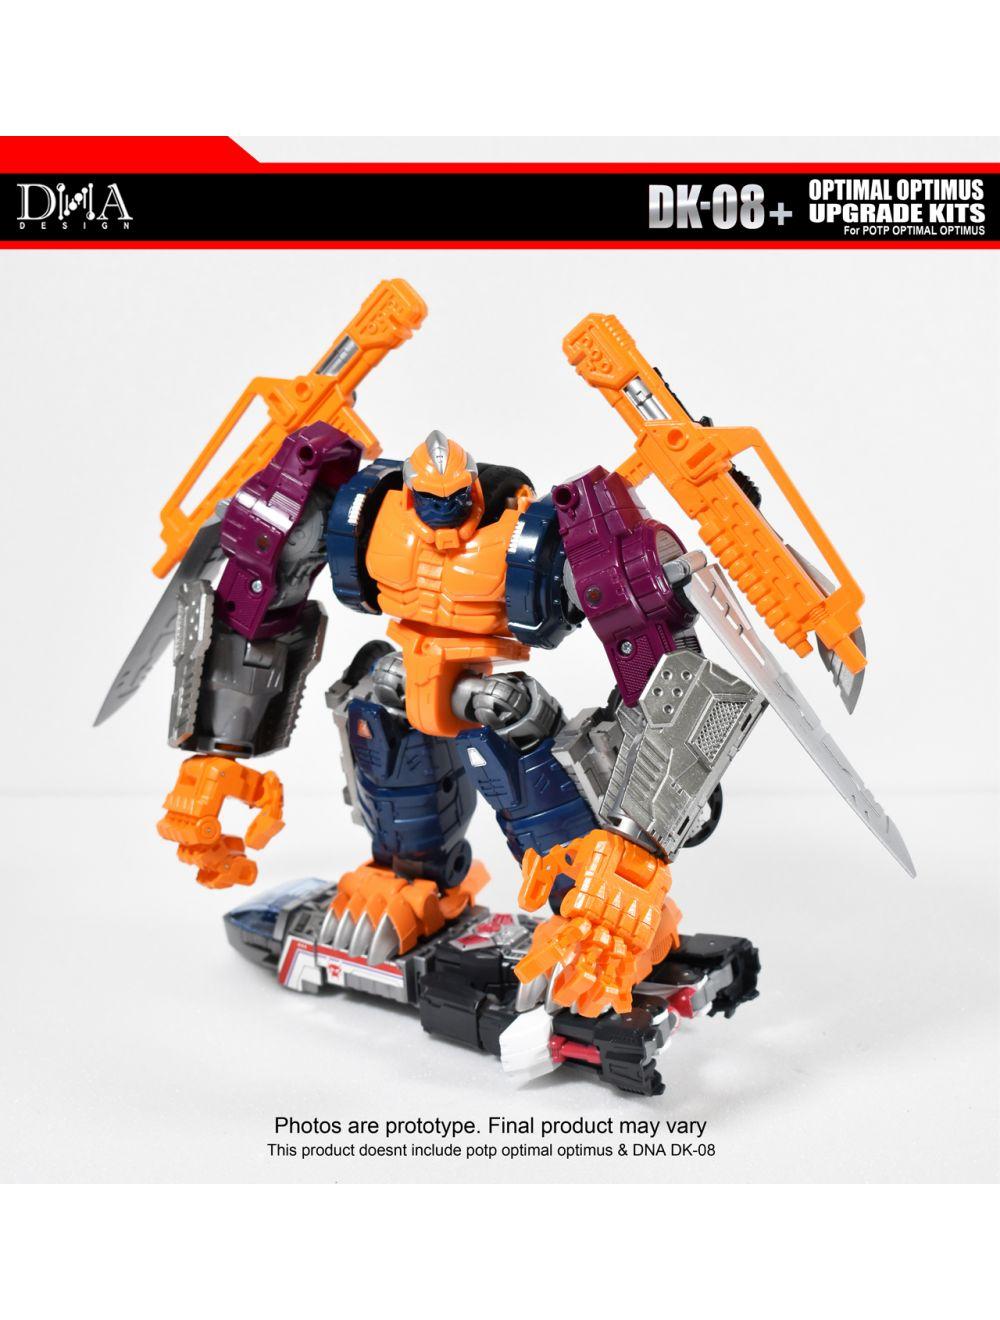 DNA Upgrade Kits DK-08 For Optimal Optimus,In stock